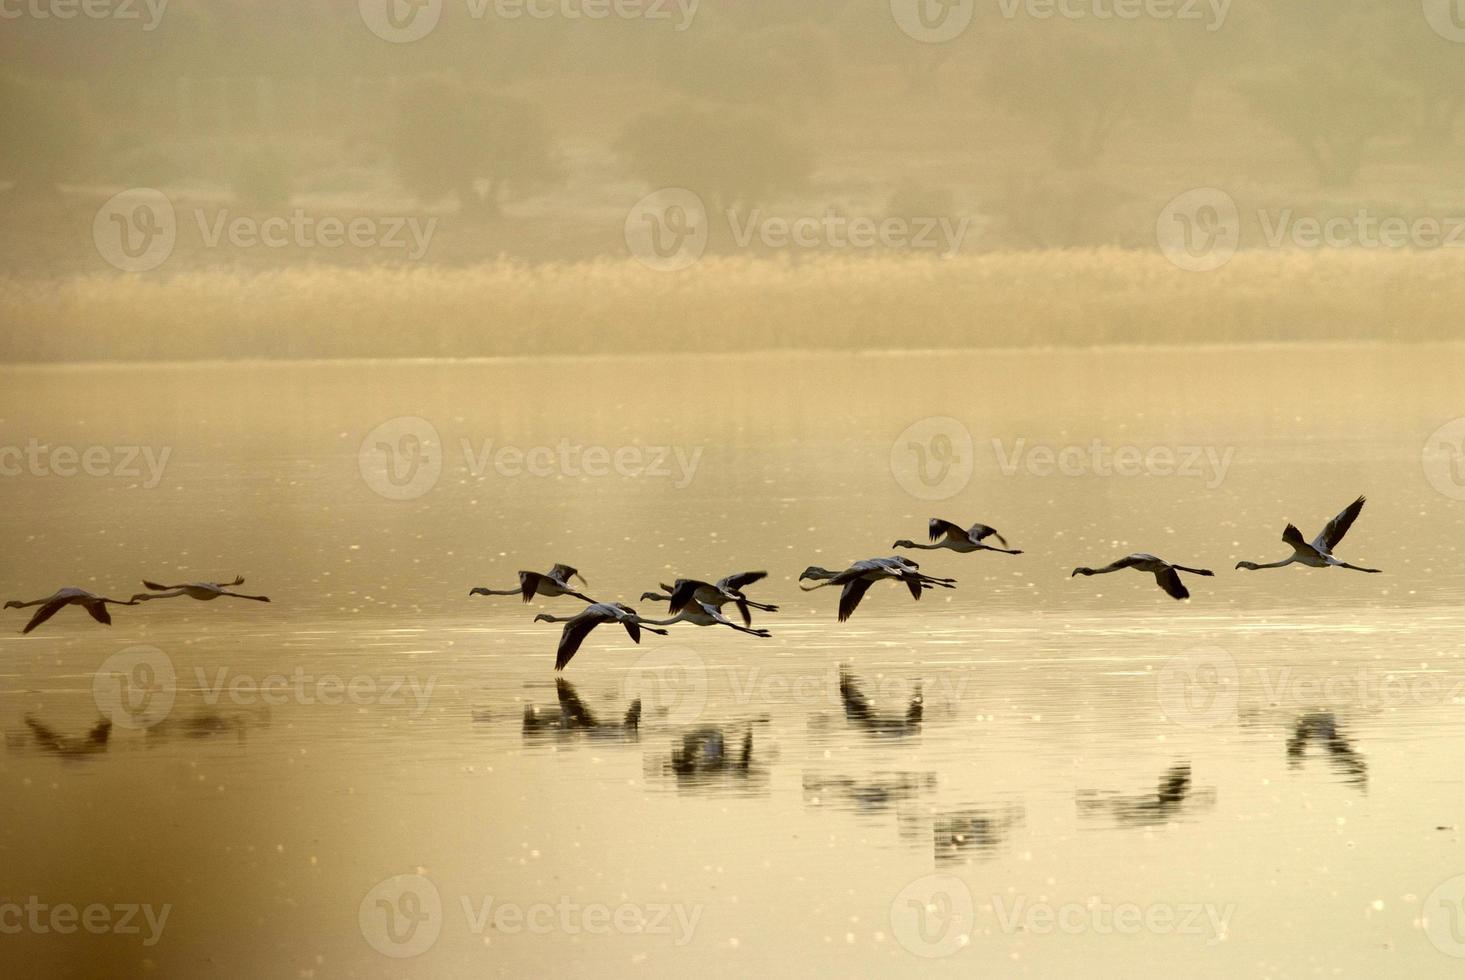 Flamingos (Phoenicopterus) in Laguna de Calderon, Moral de Calatrava. photo